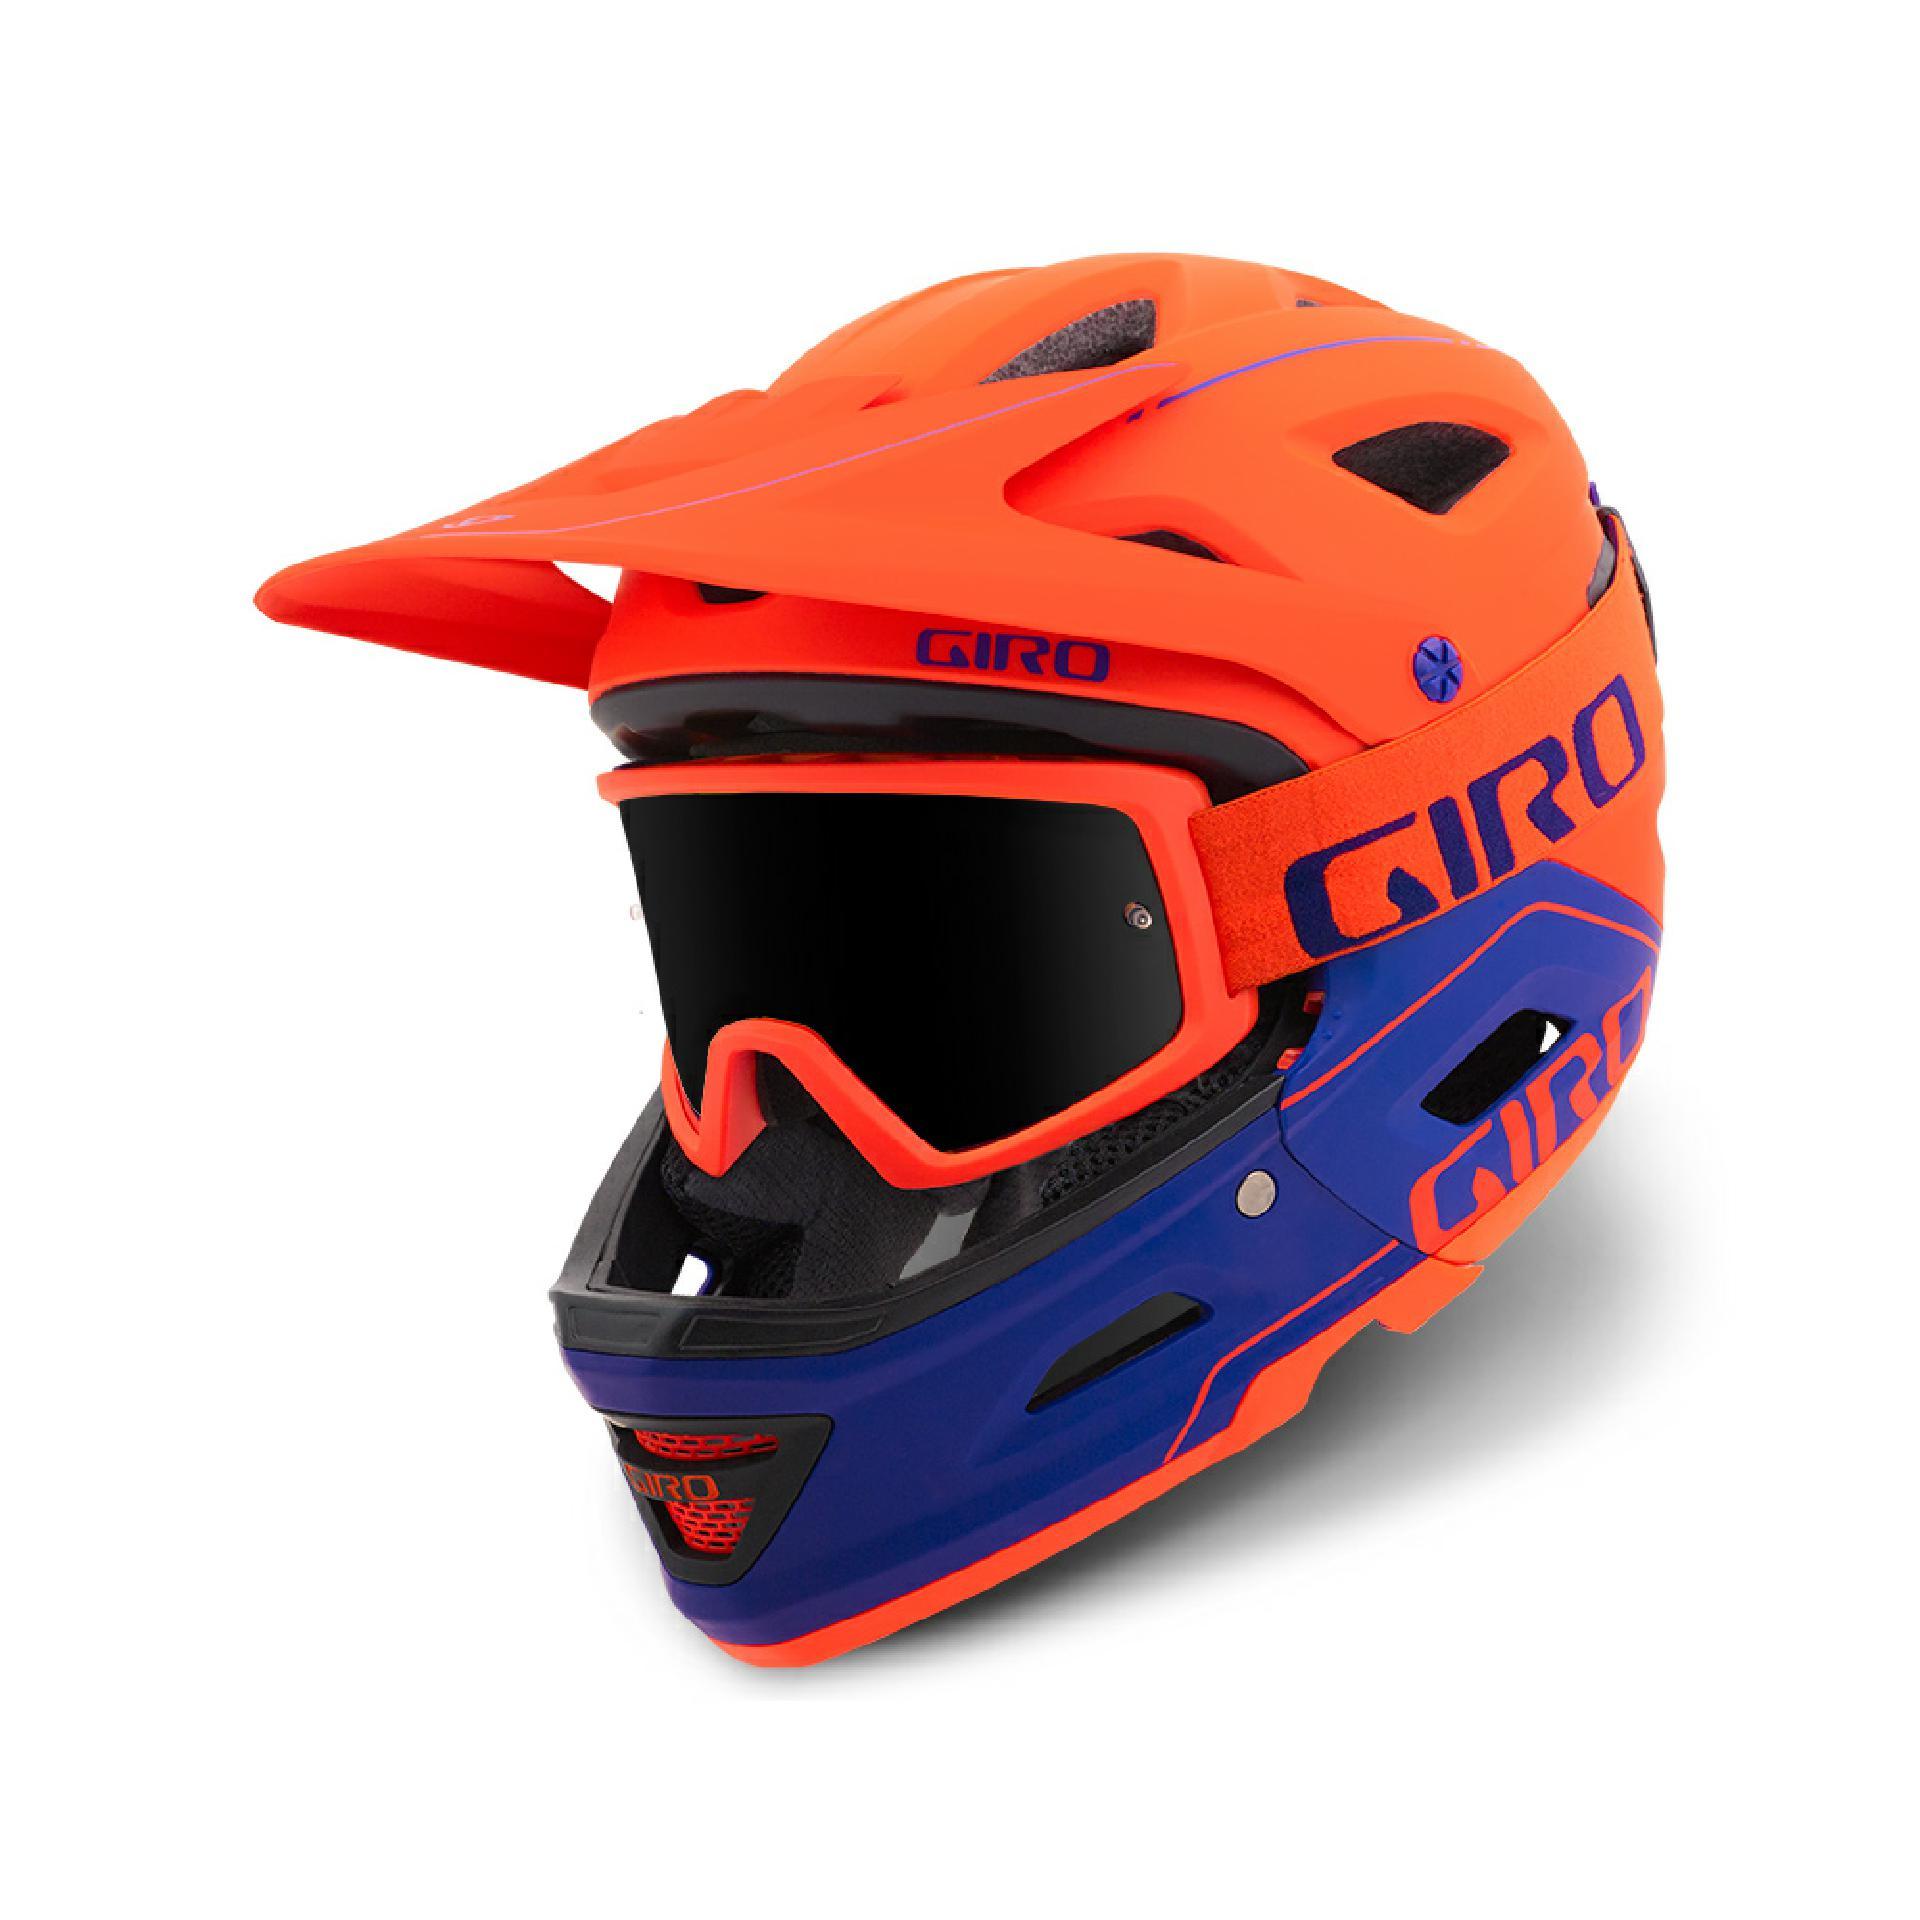 Der Giro Switchblade ist der erste vollwertige, Downhill zertifizierte, Fullface Helm mit abnehmbarem Kinnbügel.